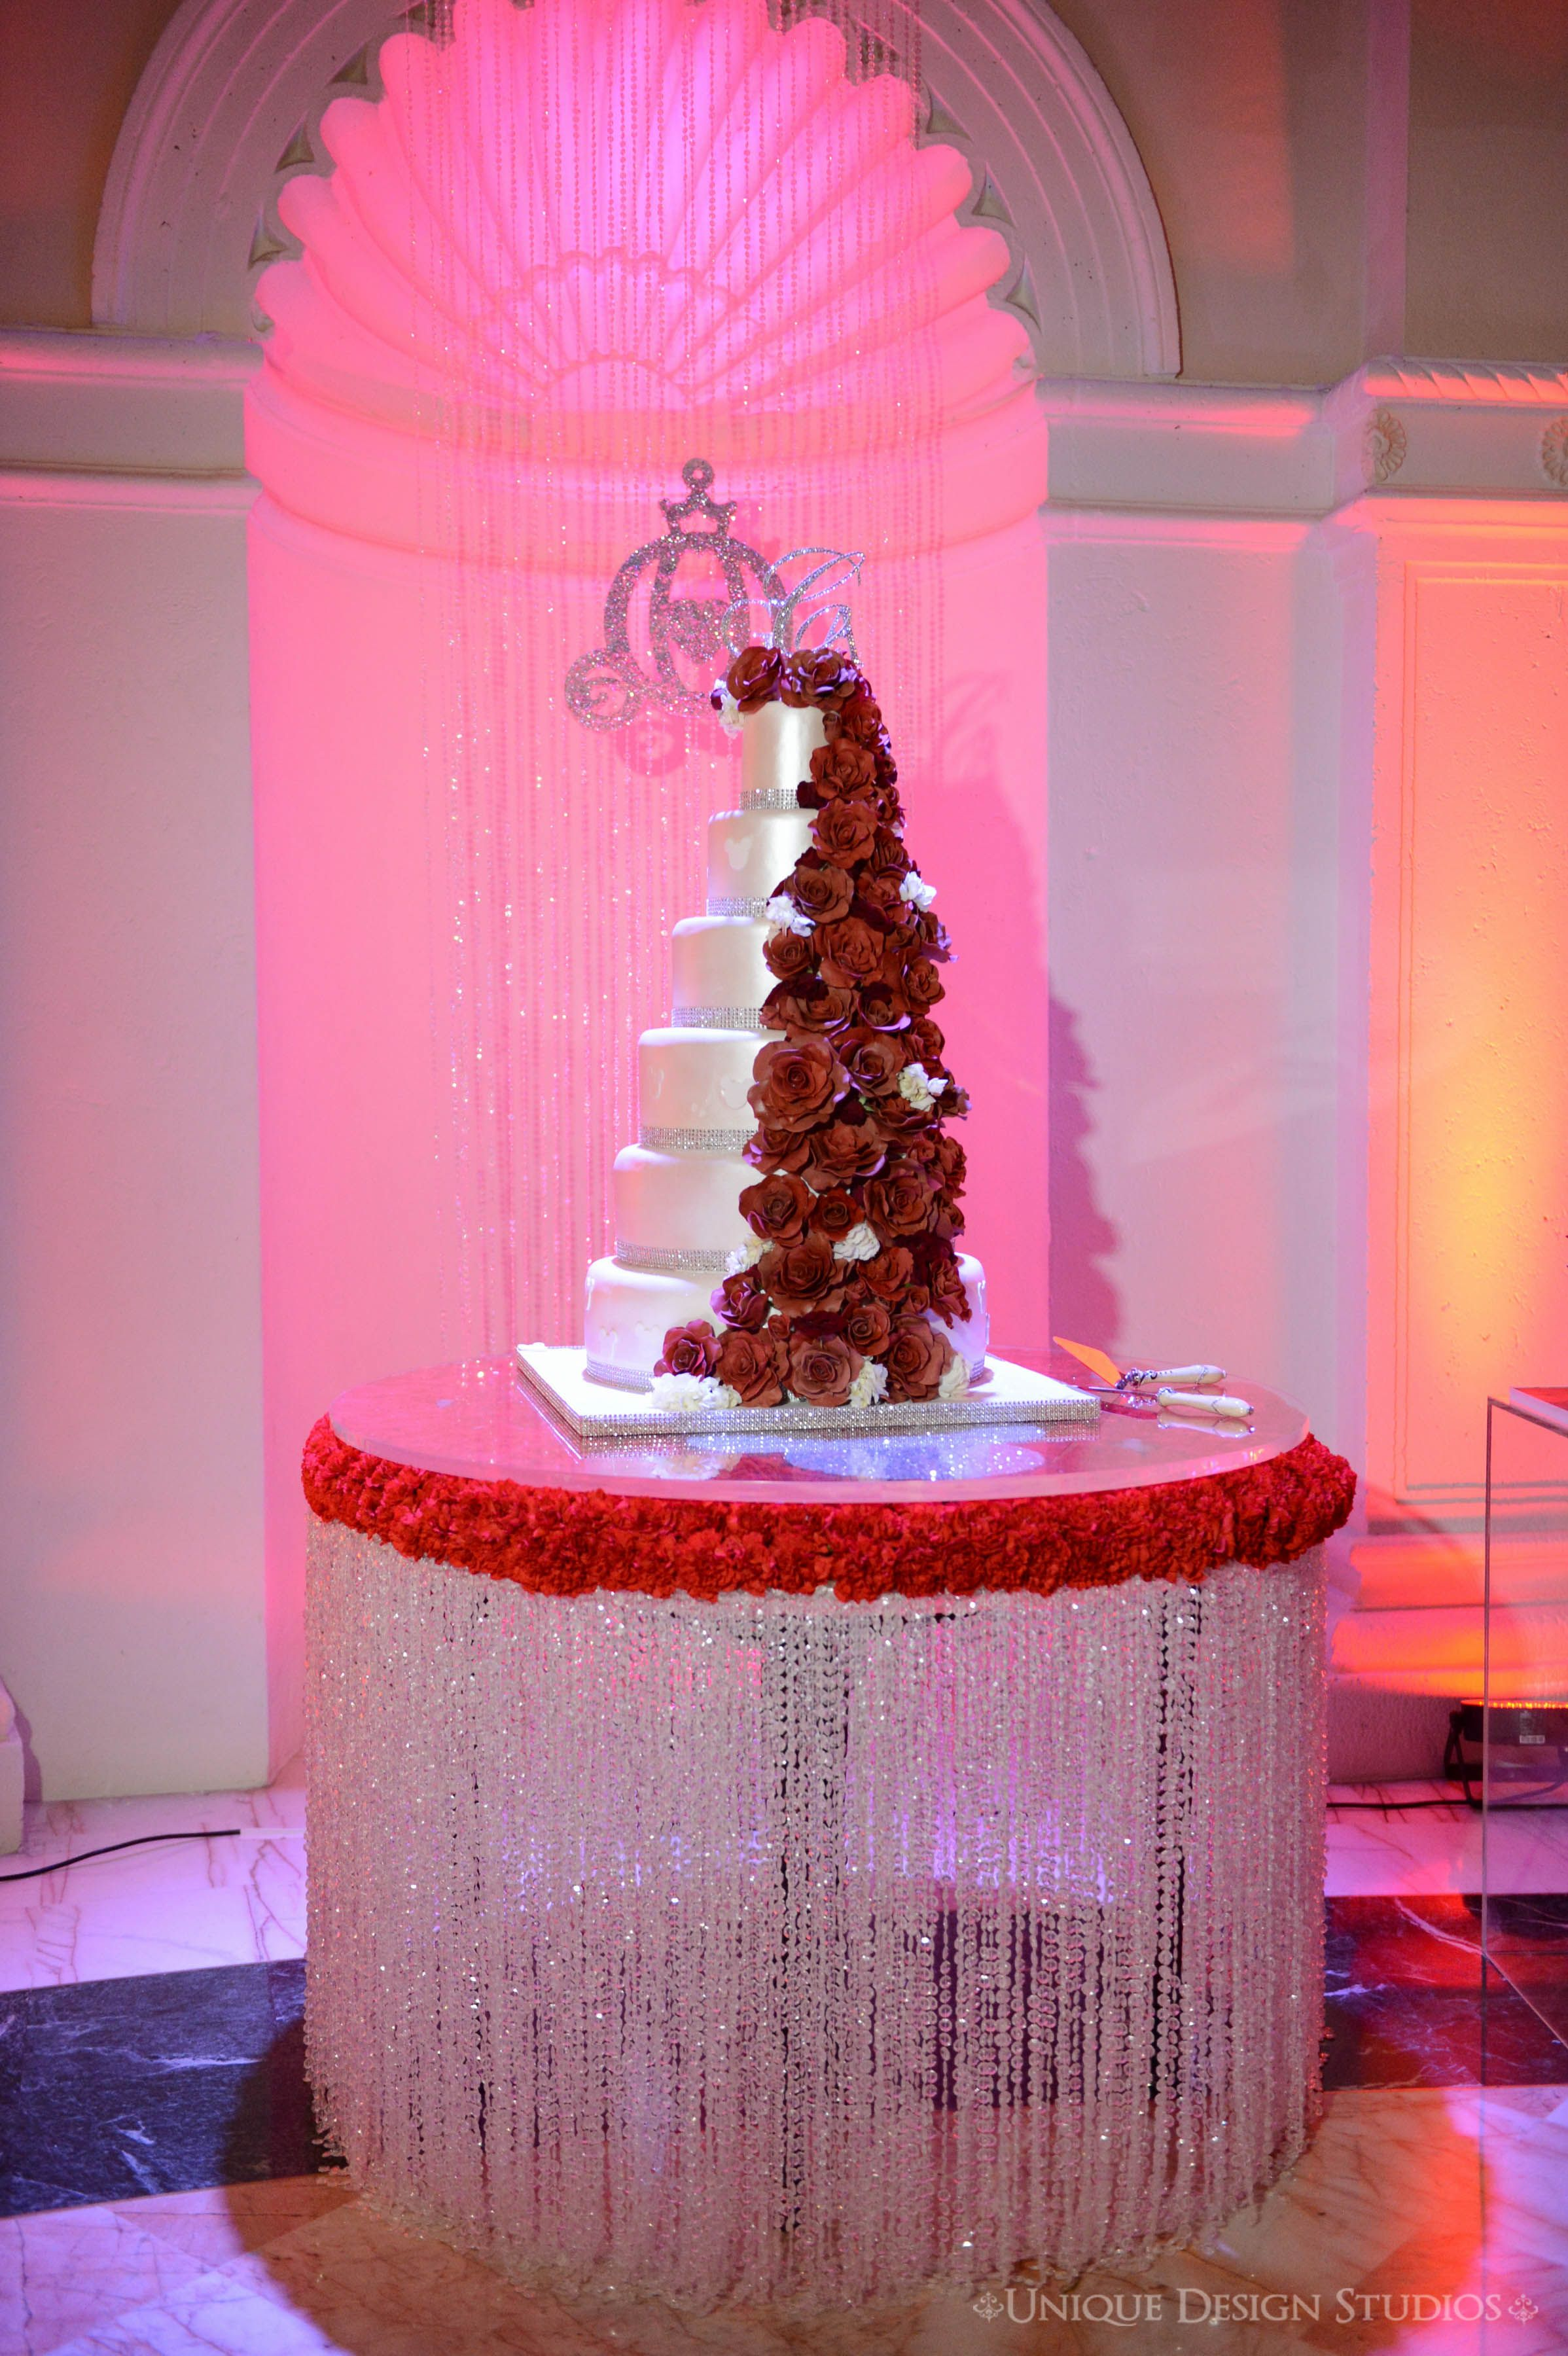 Red White & Bling for this fairytale wedding Cake design